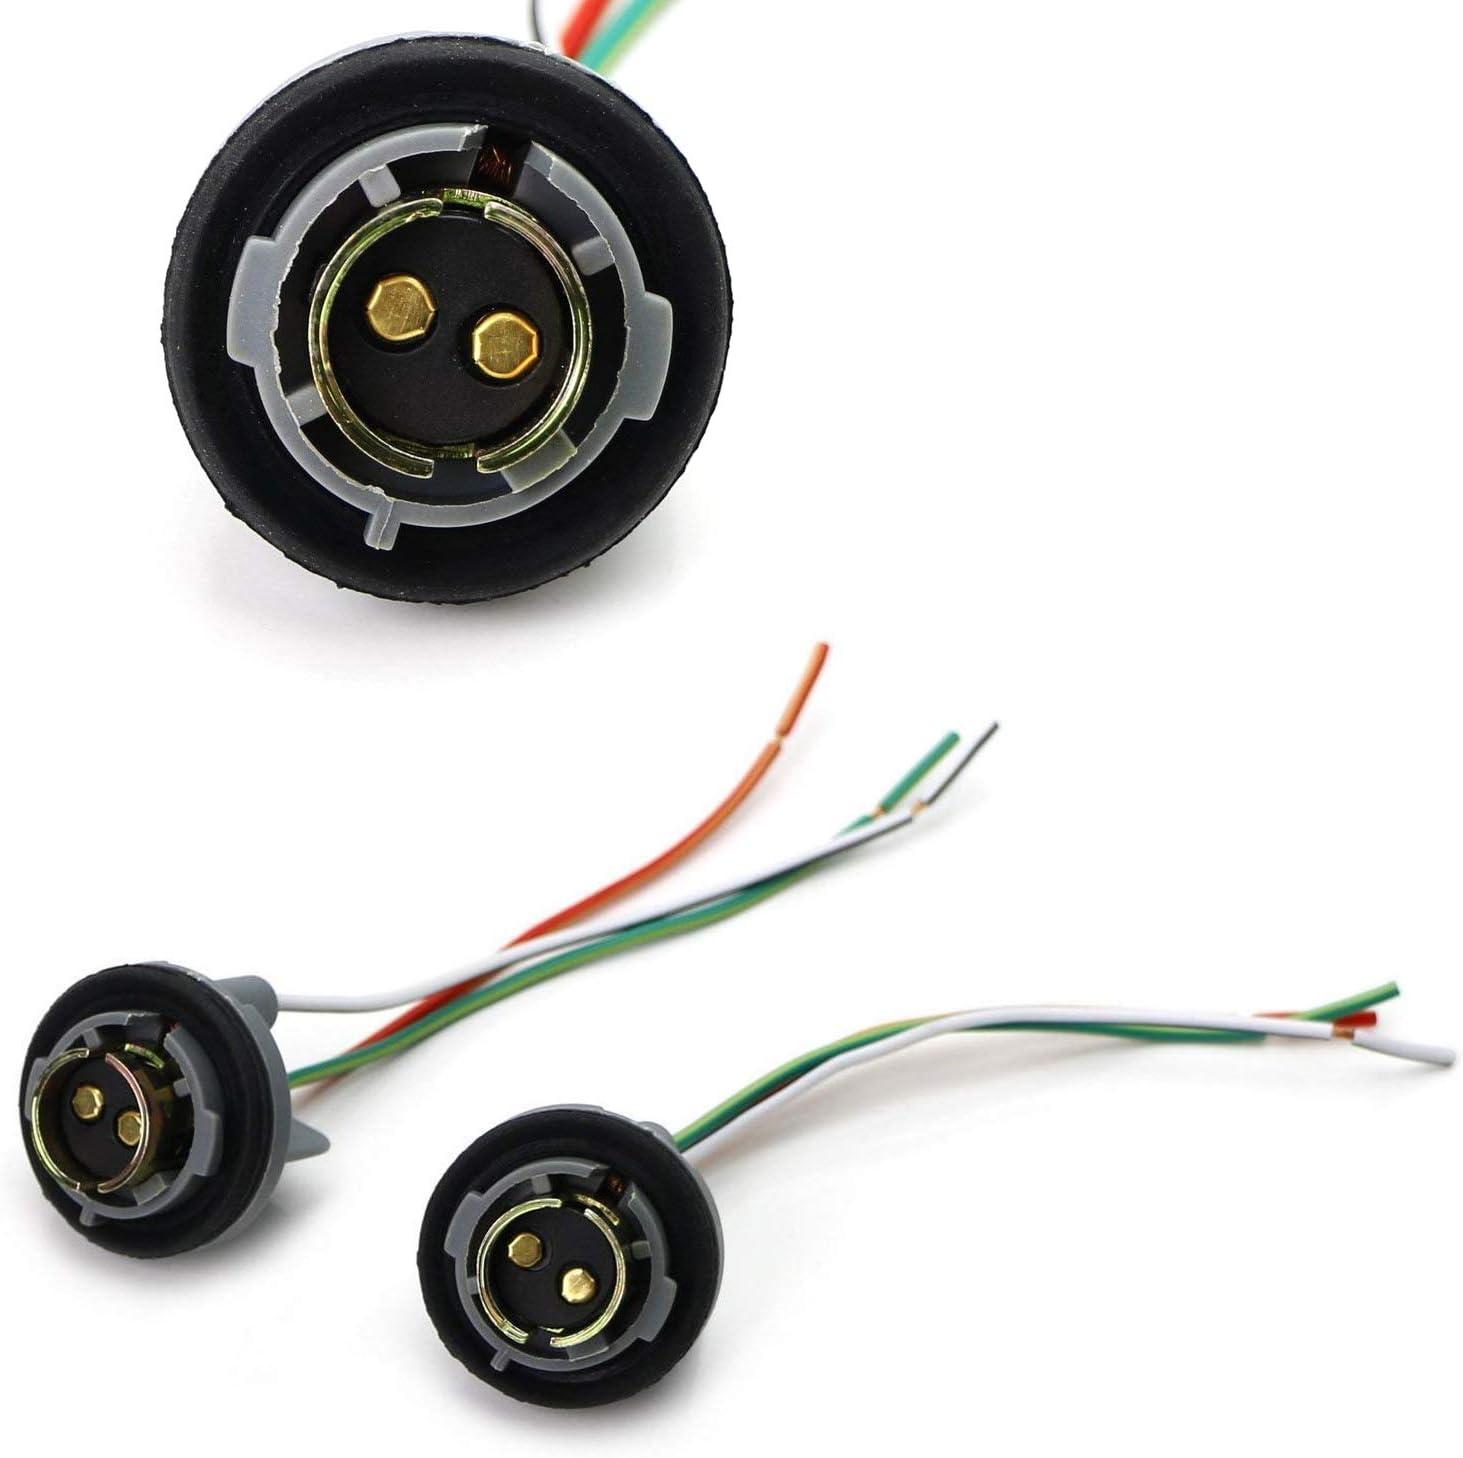 [SCHEMATICS_4PO]  Amazon.com: iJDMTOY (2) 1157 2057 2357 7528 Metal Socket/Base w/ Pigtail Wiring  Harness Compatible With Turn Signal, Brake/Tail Lights or LED Bulbs  Retrofit, etc: Automotive | Light Bulb Socket Wiring Diagram Us |  | Amazon.com